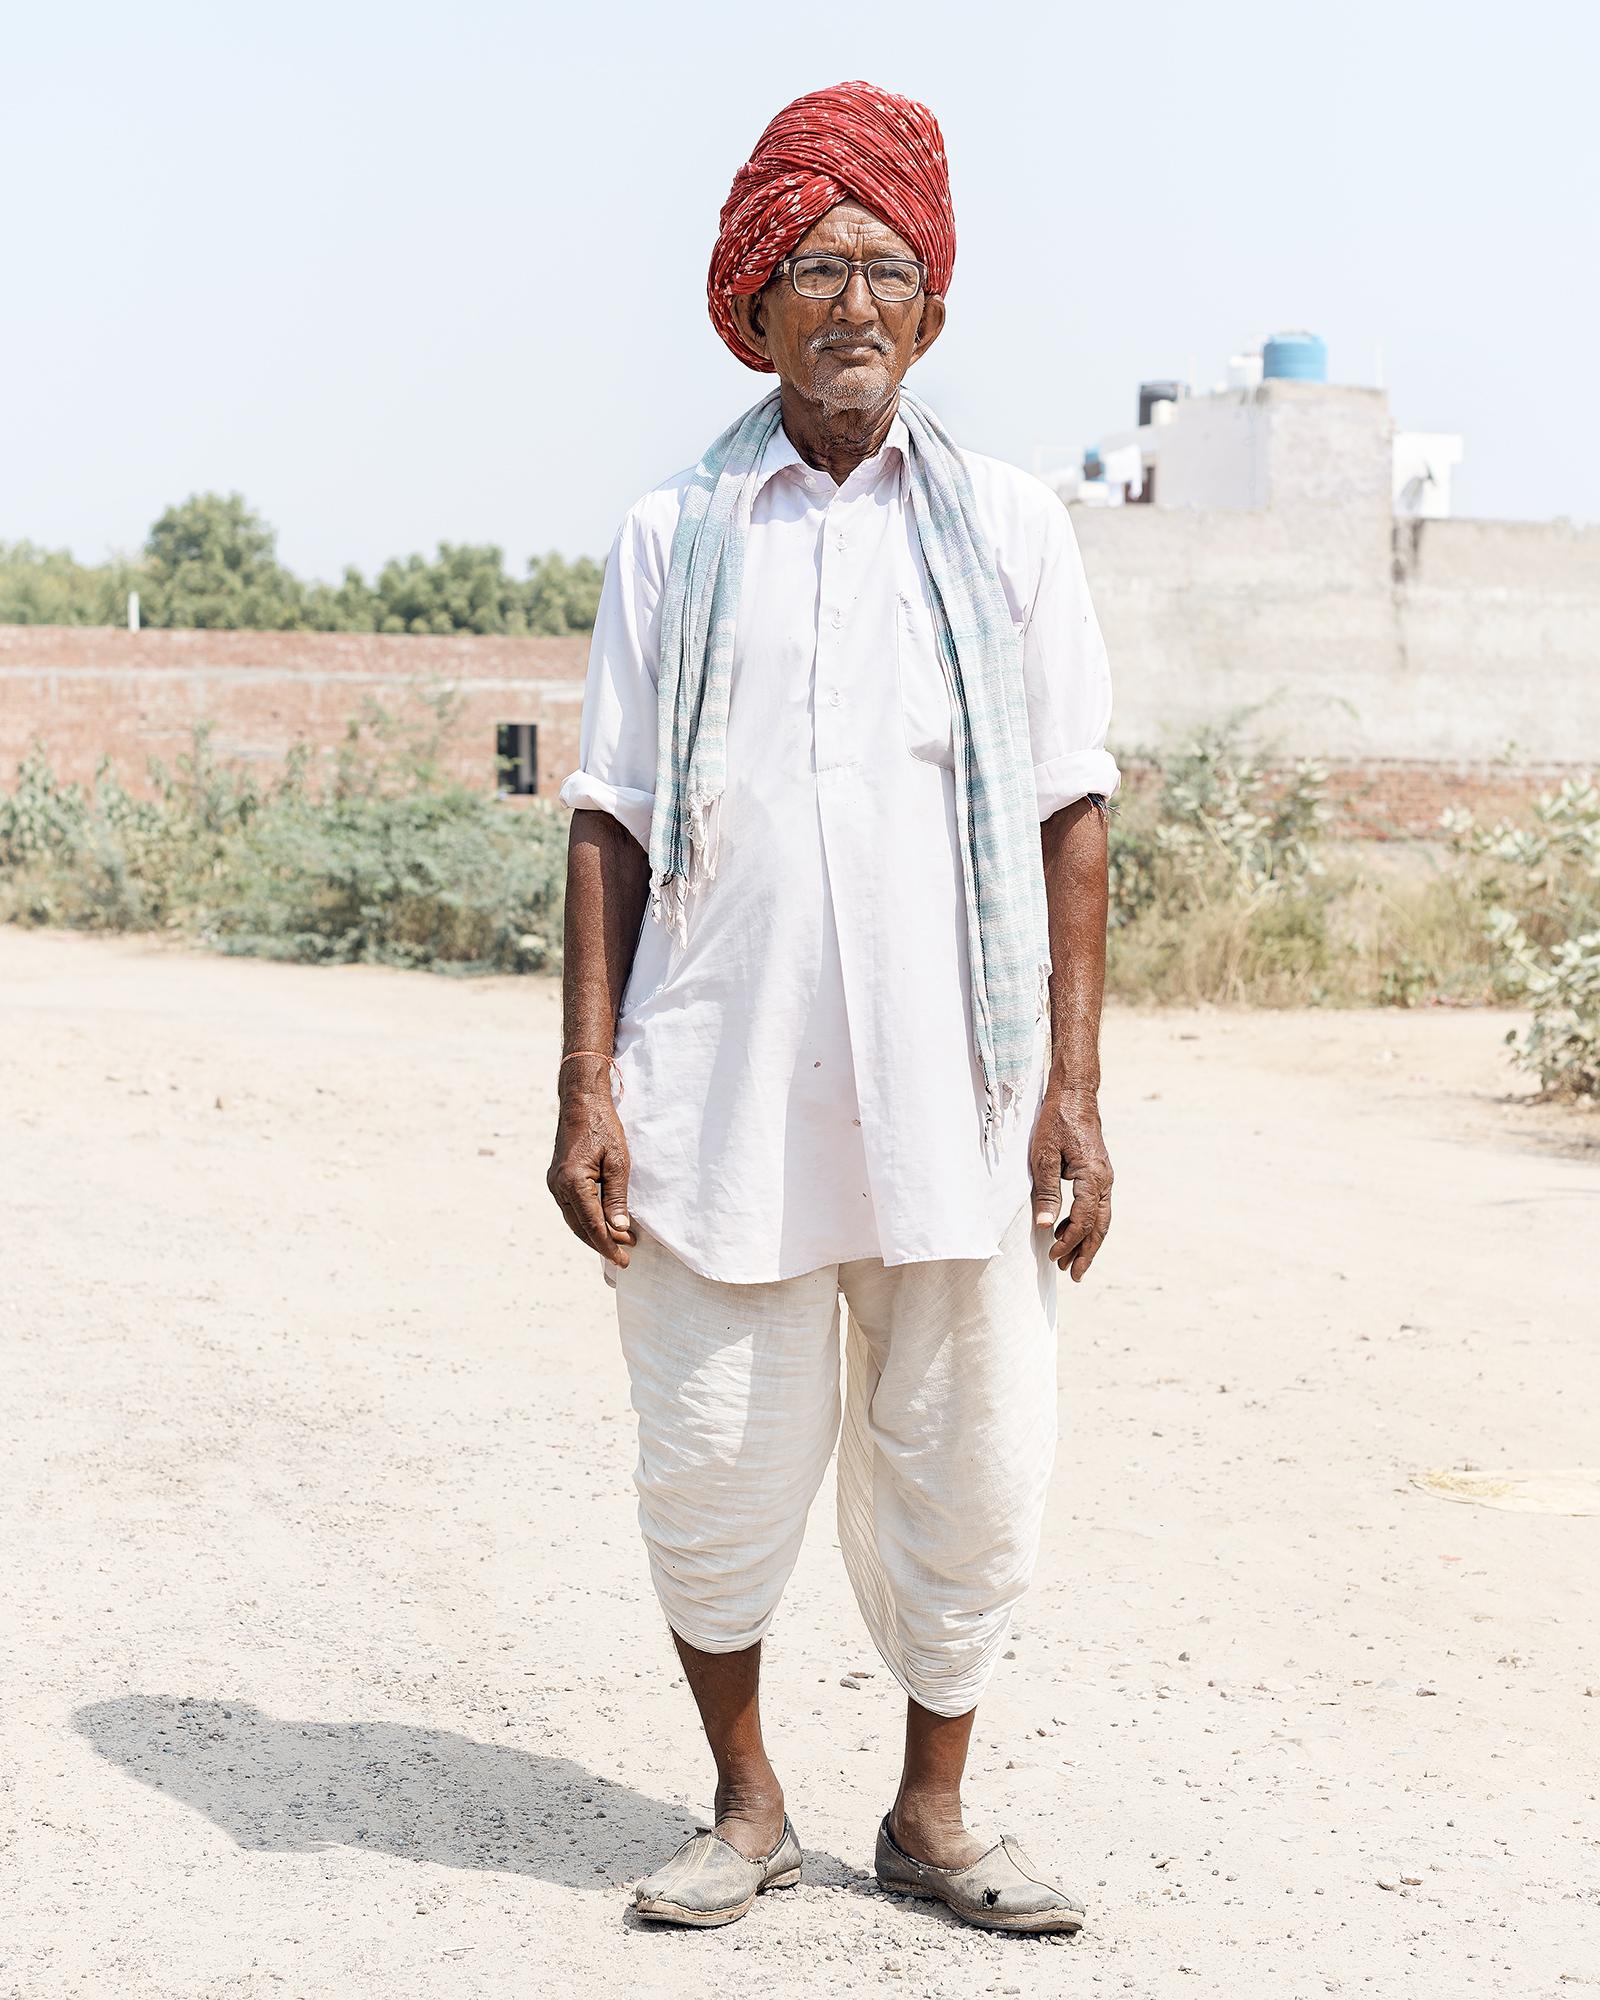 08_Unknown, Near Jaipur, India, 2017.jpg